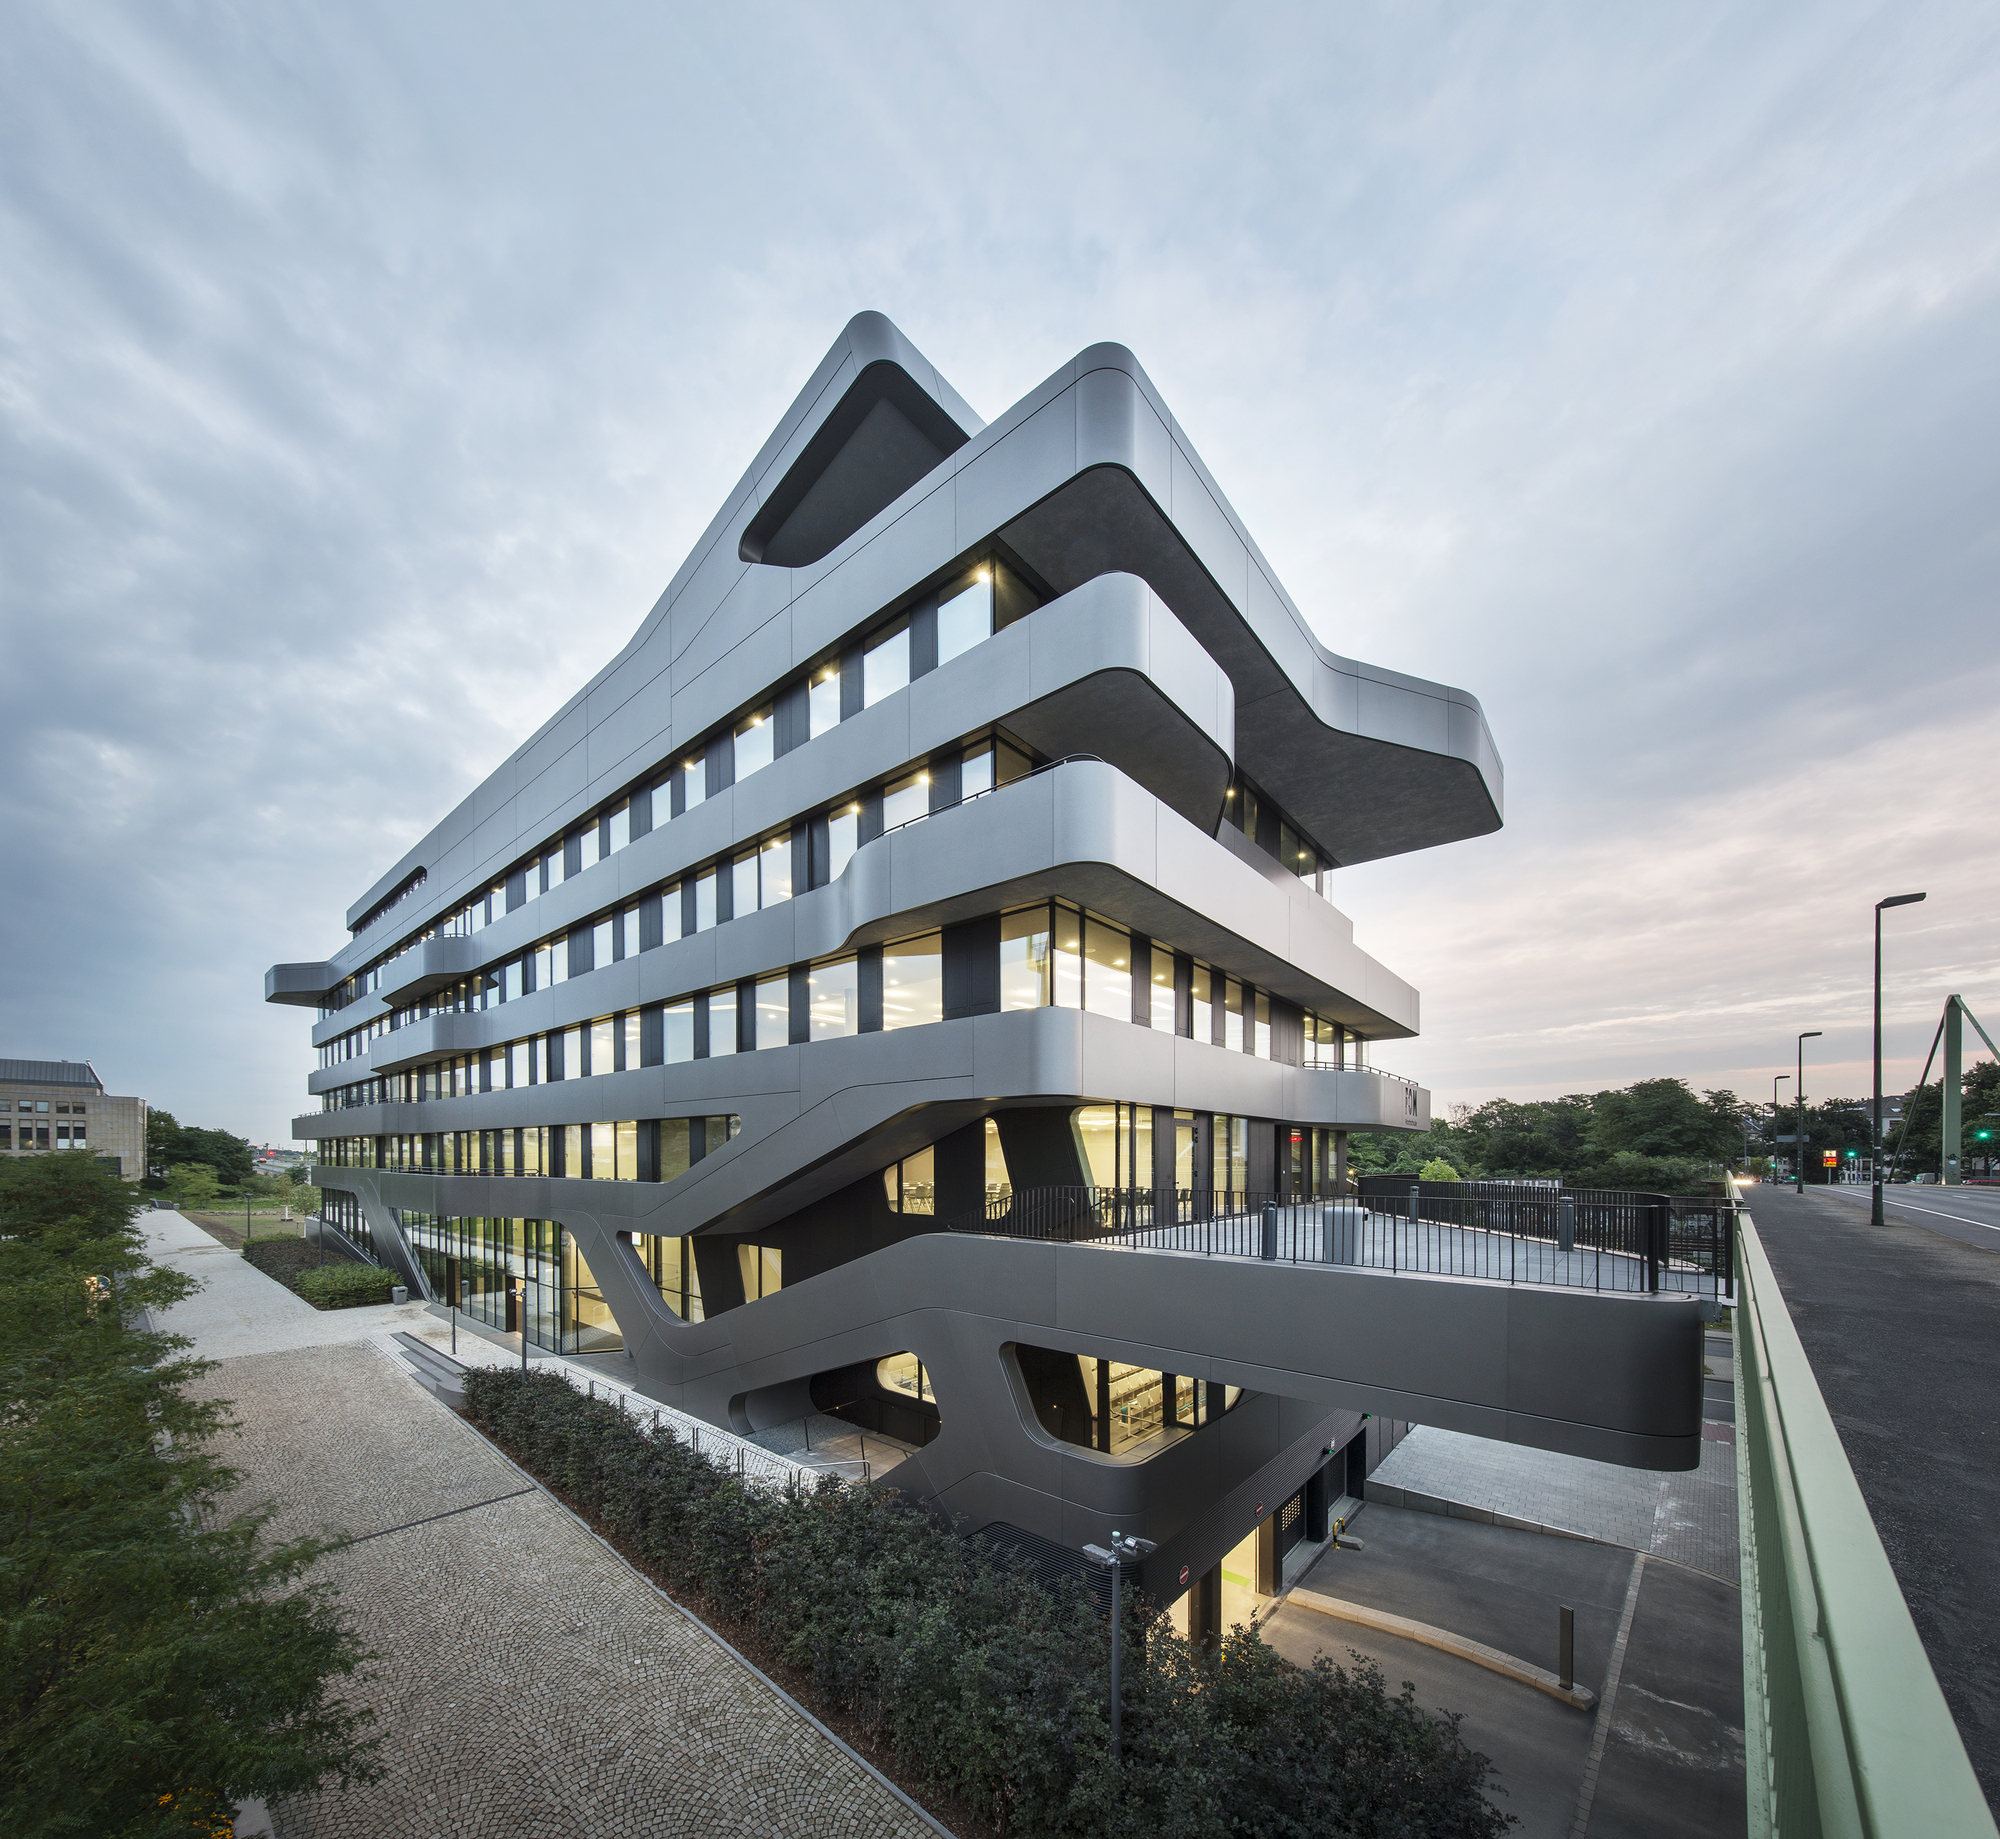 Fom Hochschule Building In Sseldorf . Mayer